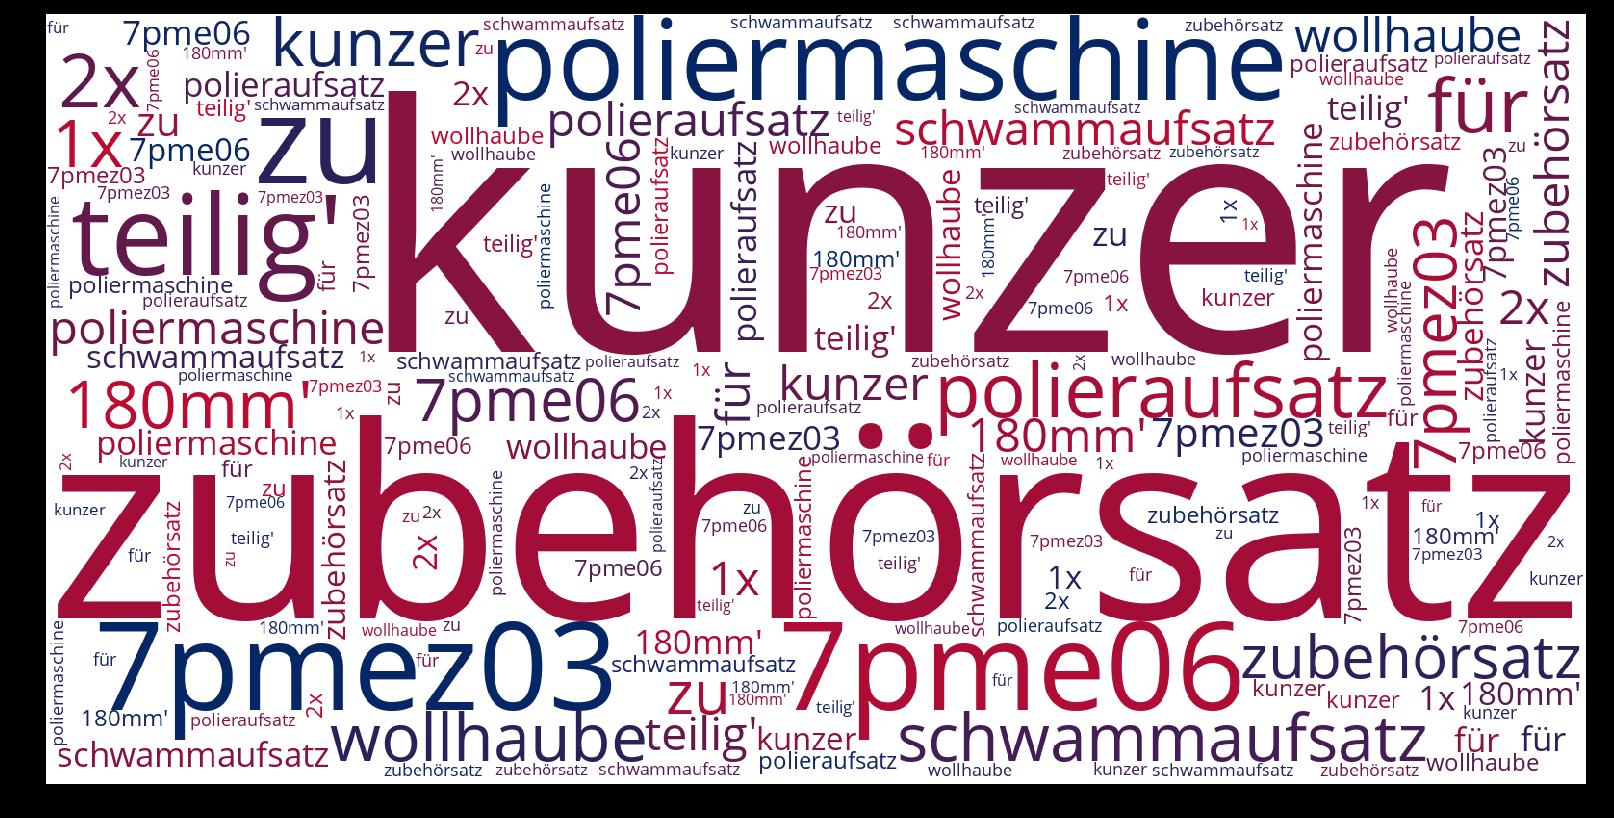 Lackschleifmaschine-wordcloud